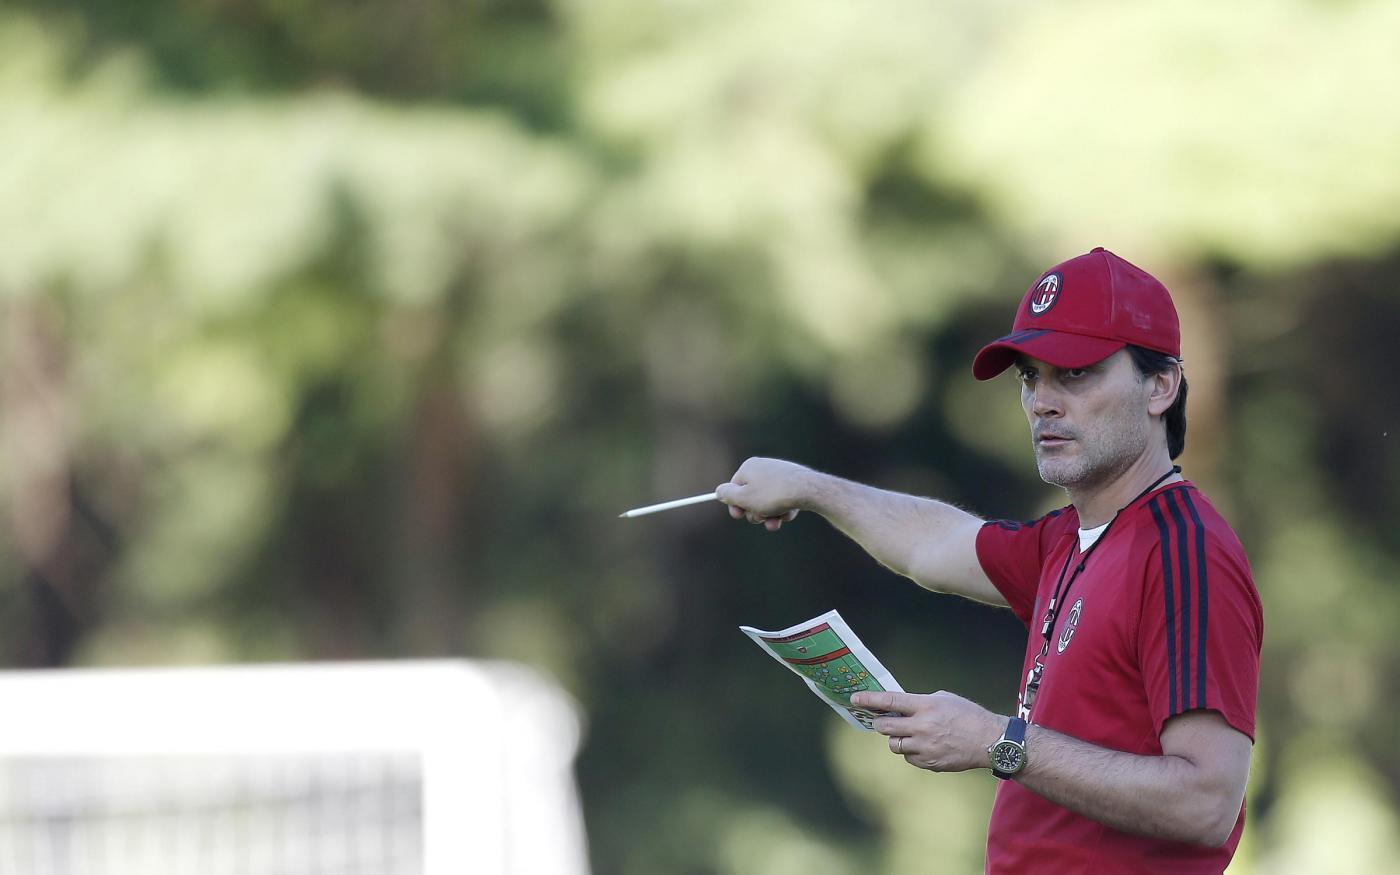 Attento Milan, la Juve ti soffia via Andrè Gomes